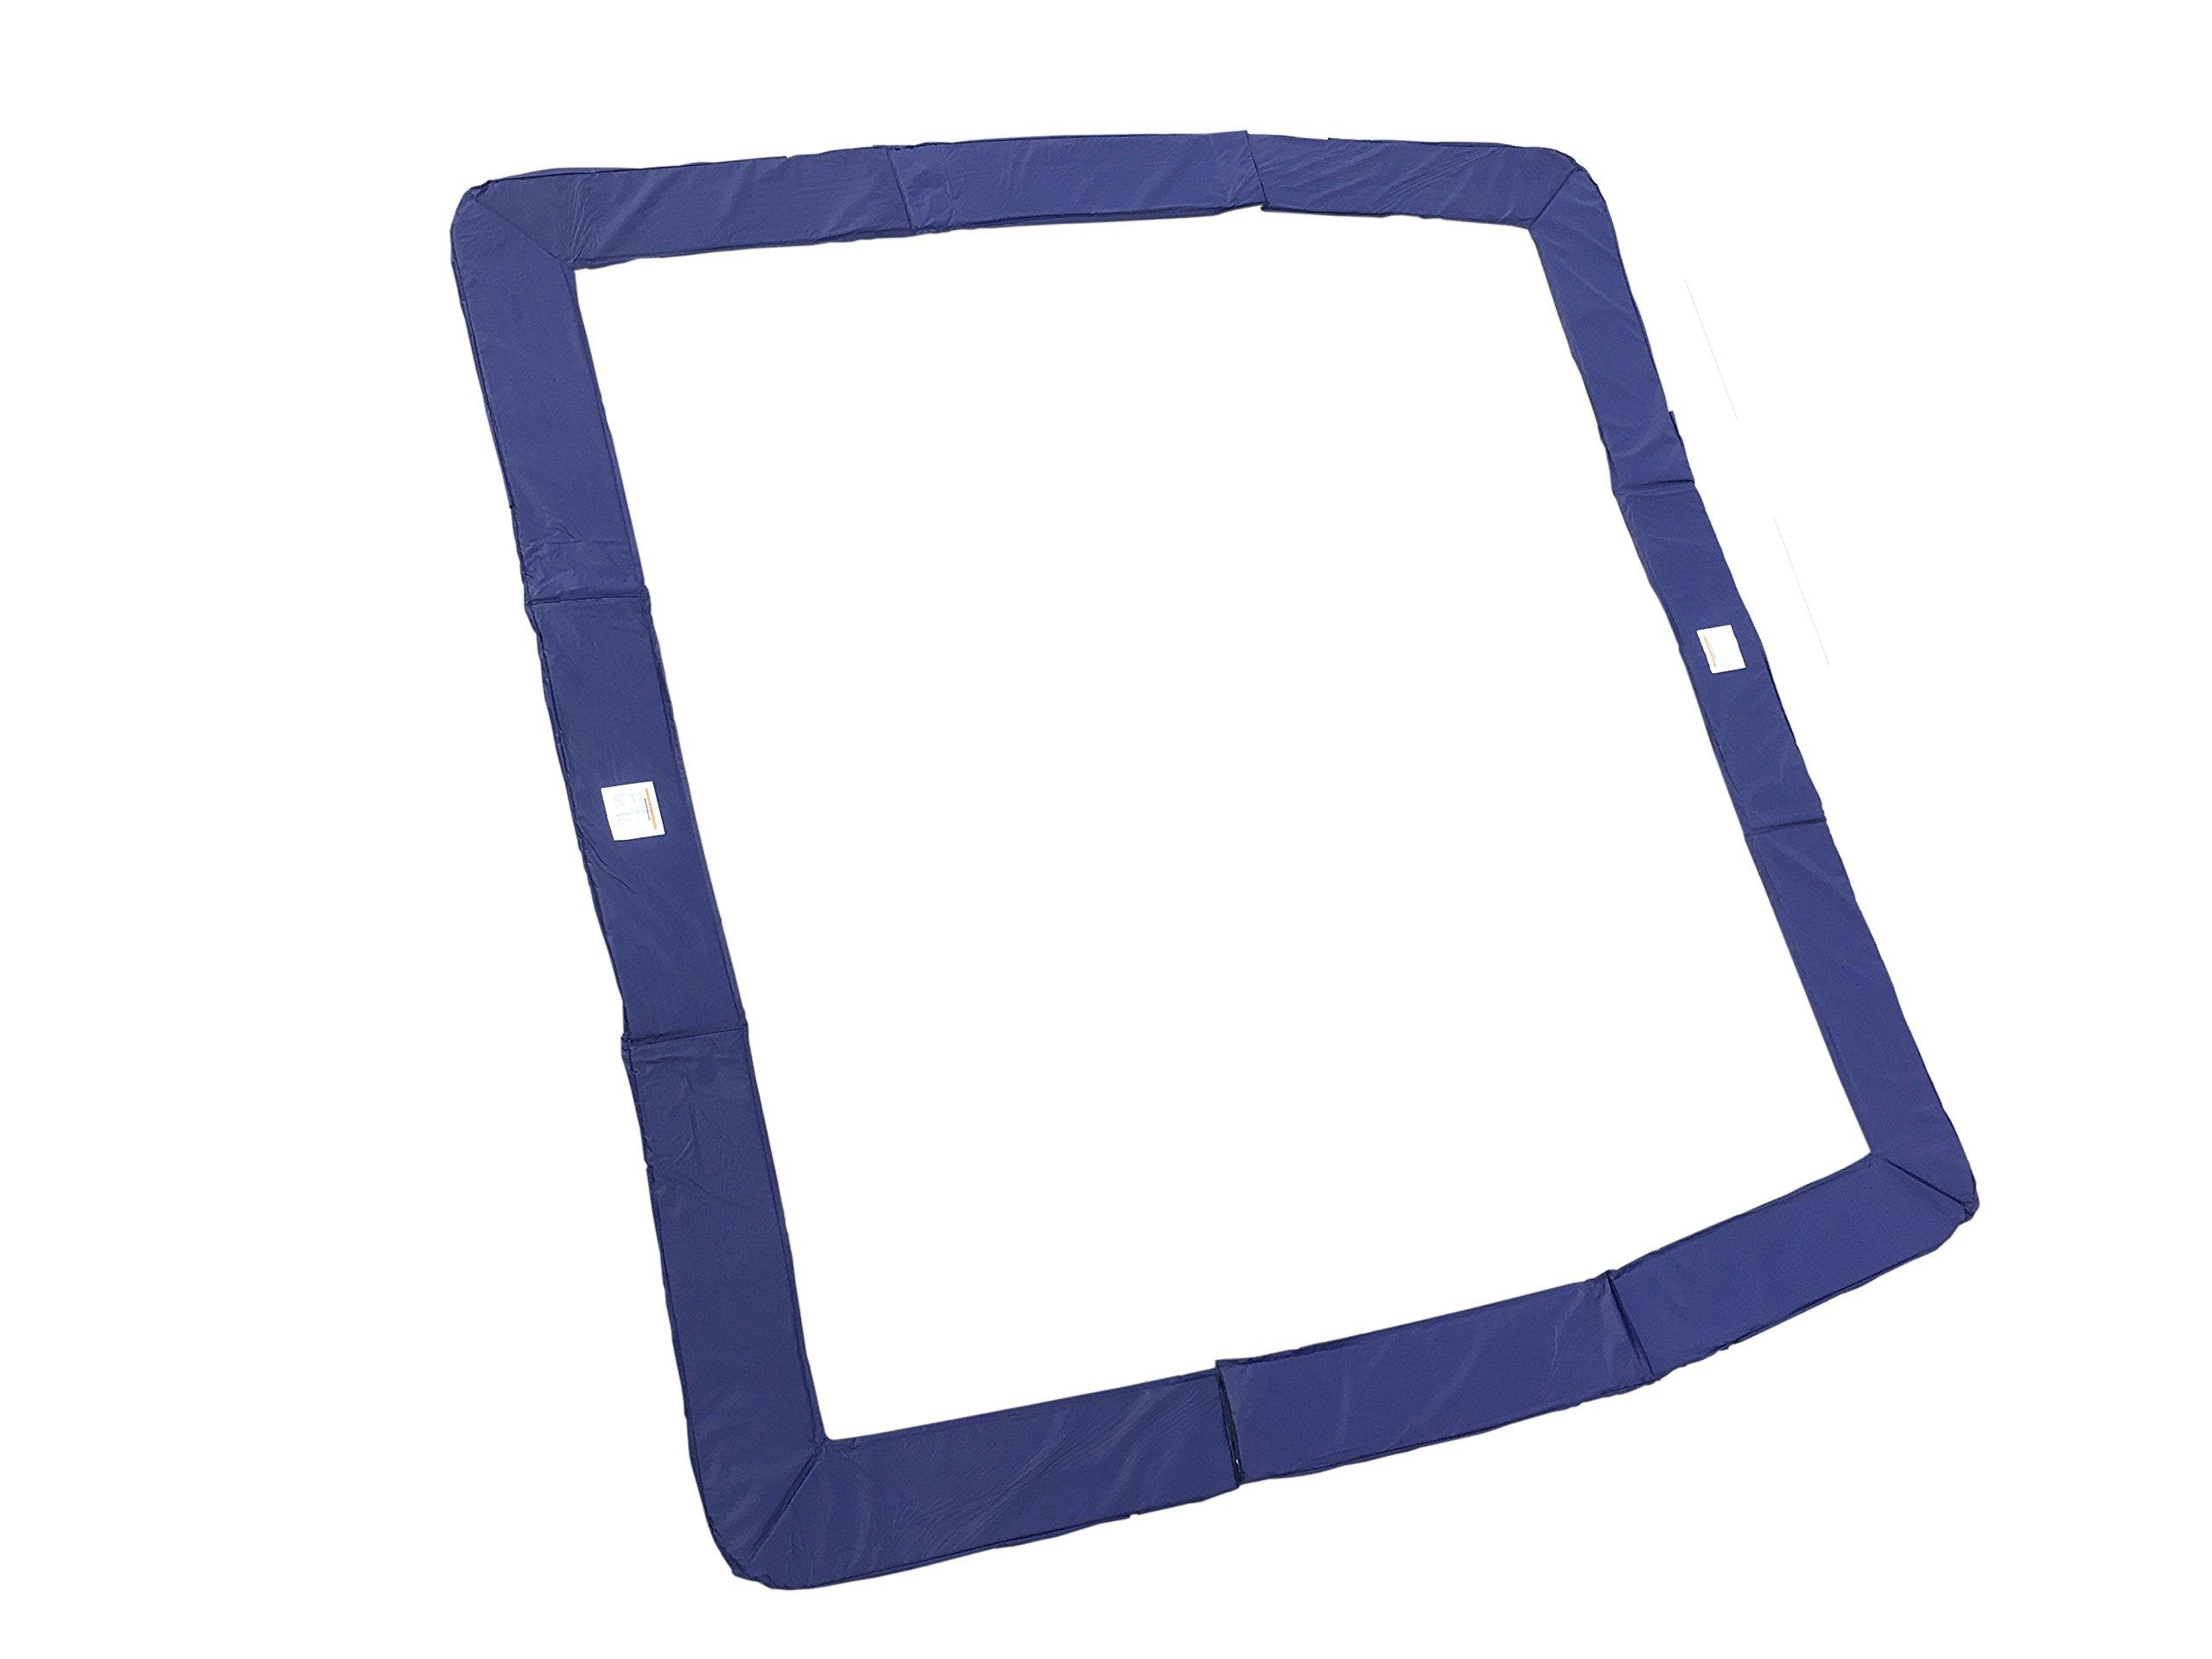 Trampoline Pad Blue Square 13 ft x 13 ft | Fits Skywalker 13 ft x 13 ft Frames | Pad Only by Trampoline Pro